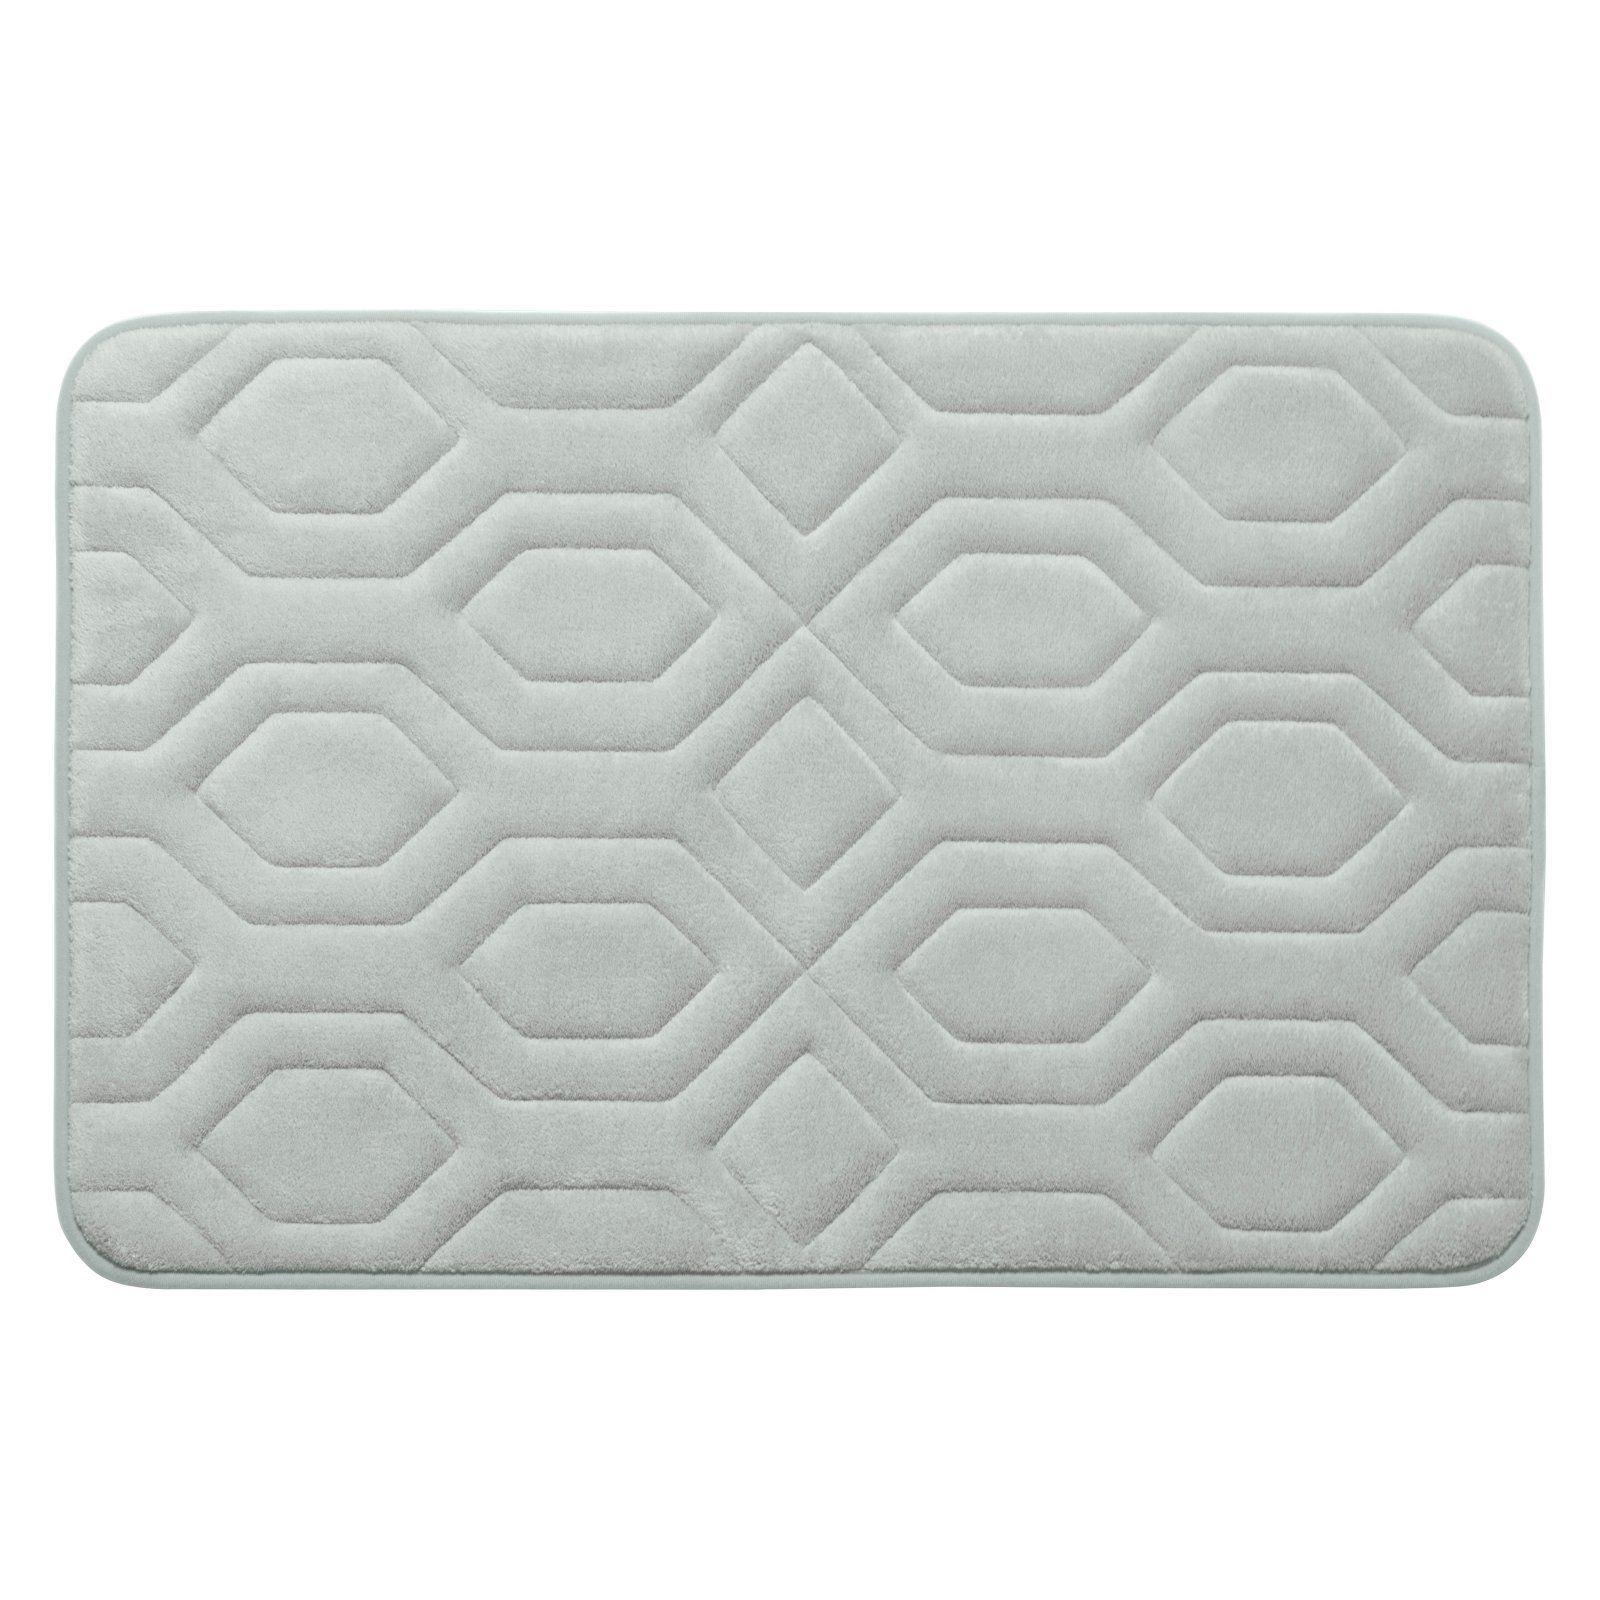 Bounce Comfort Turtle Shell Premium Extra Thick Memory Foam Bath